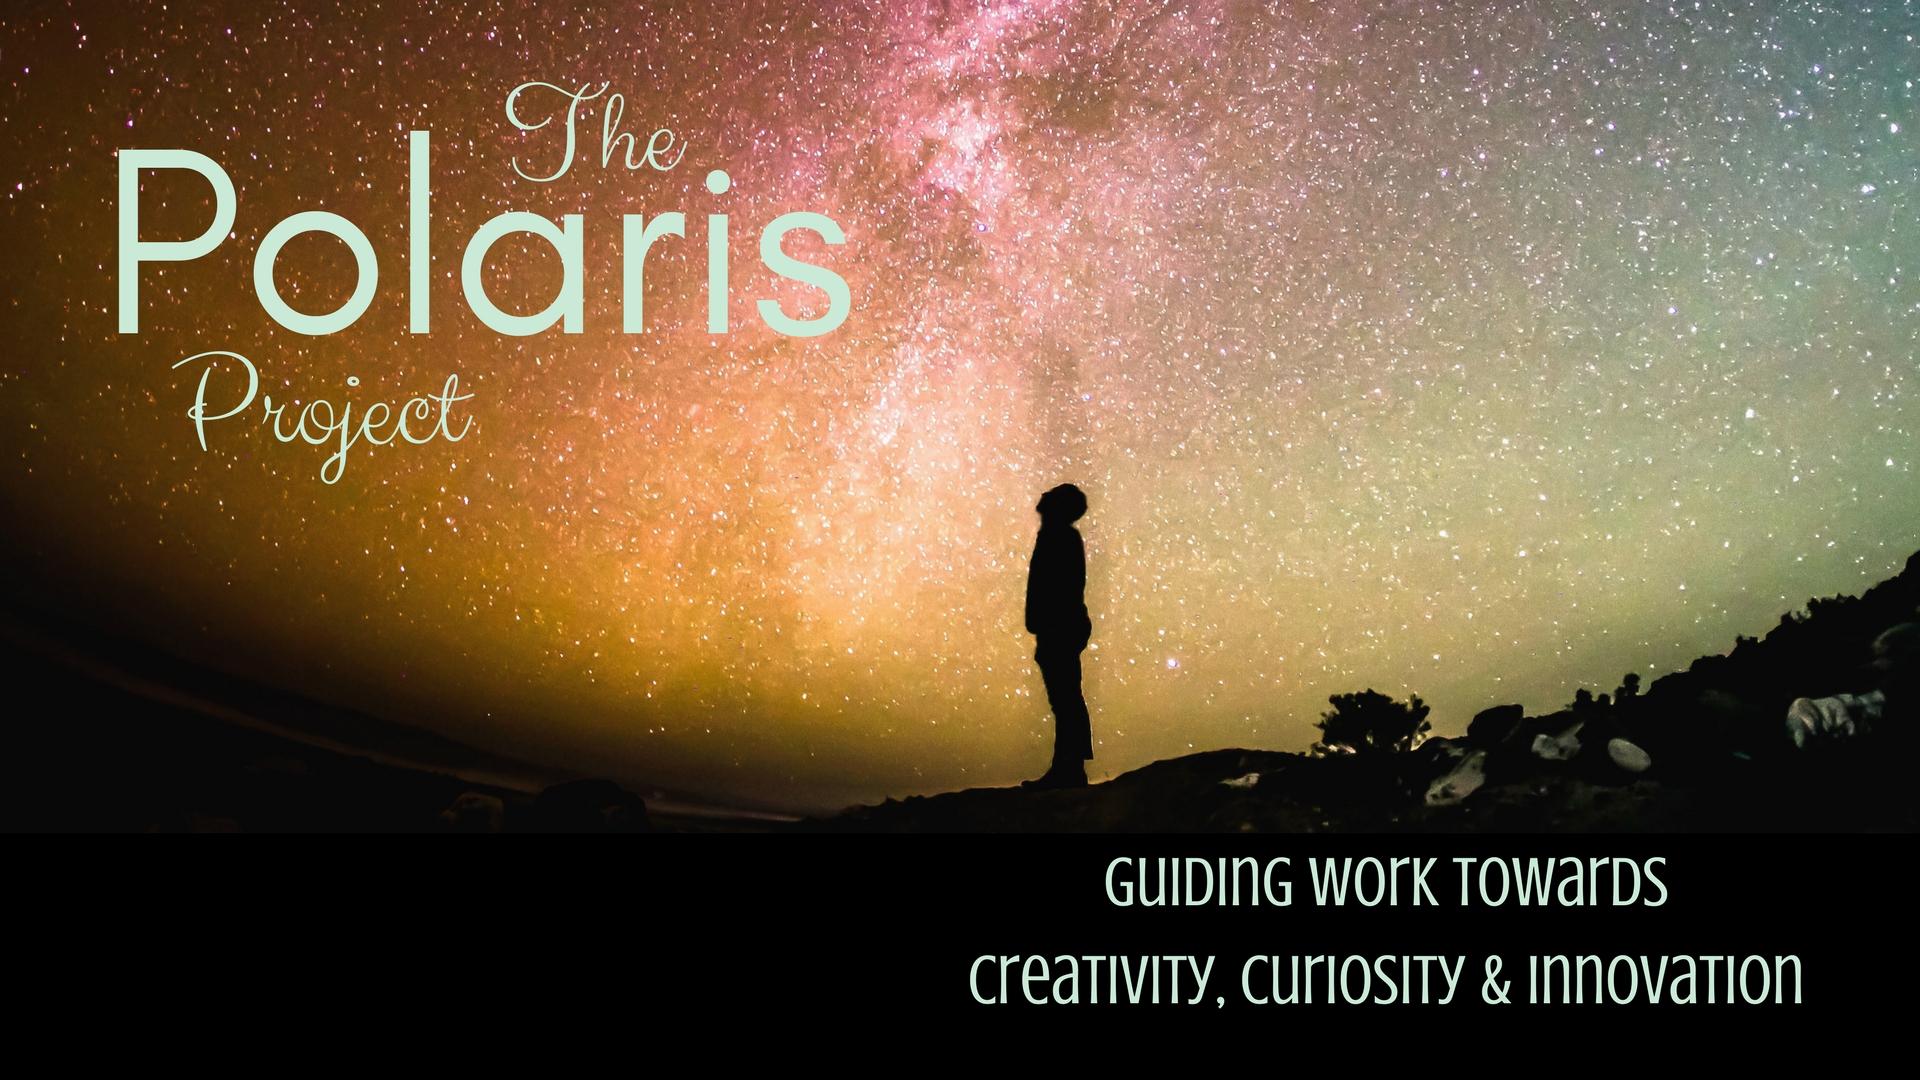 The Polaris Project